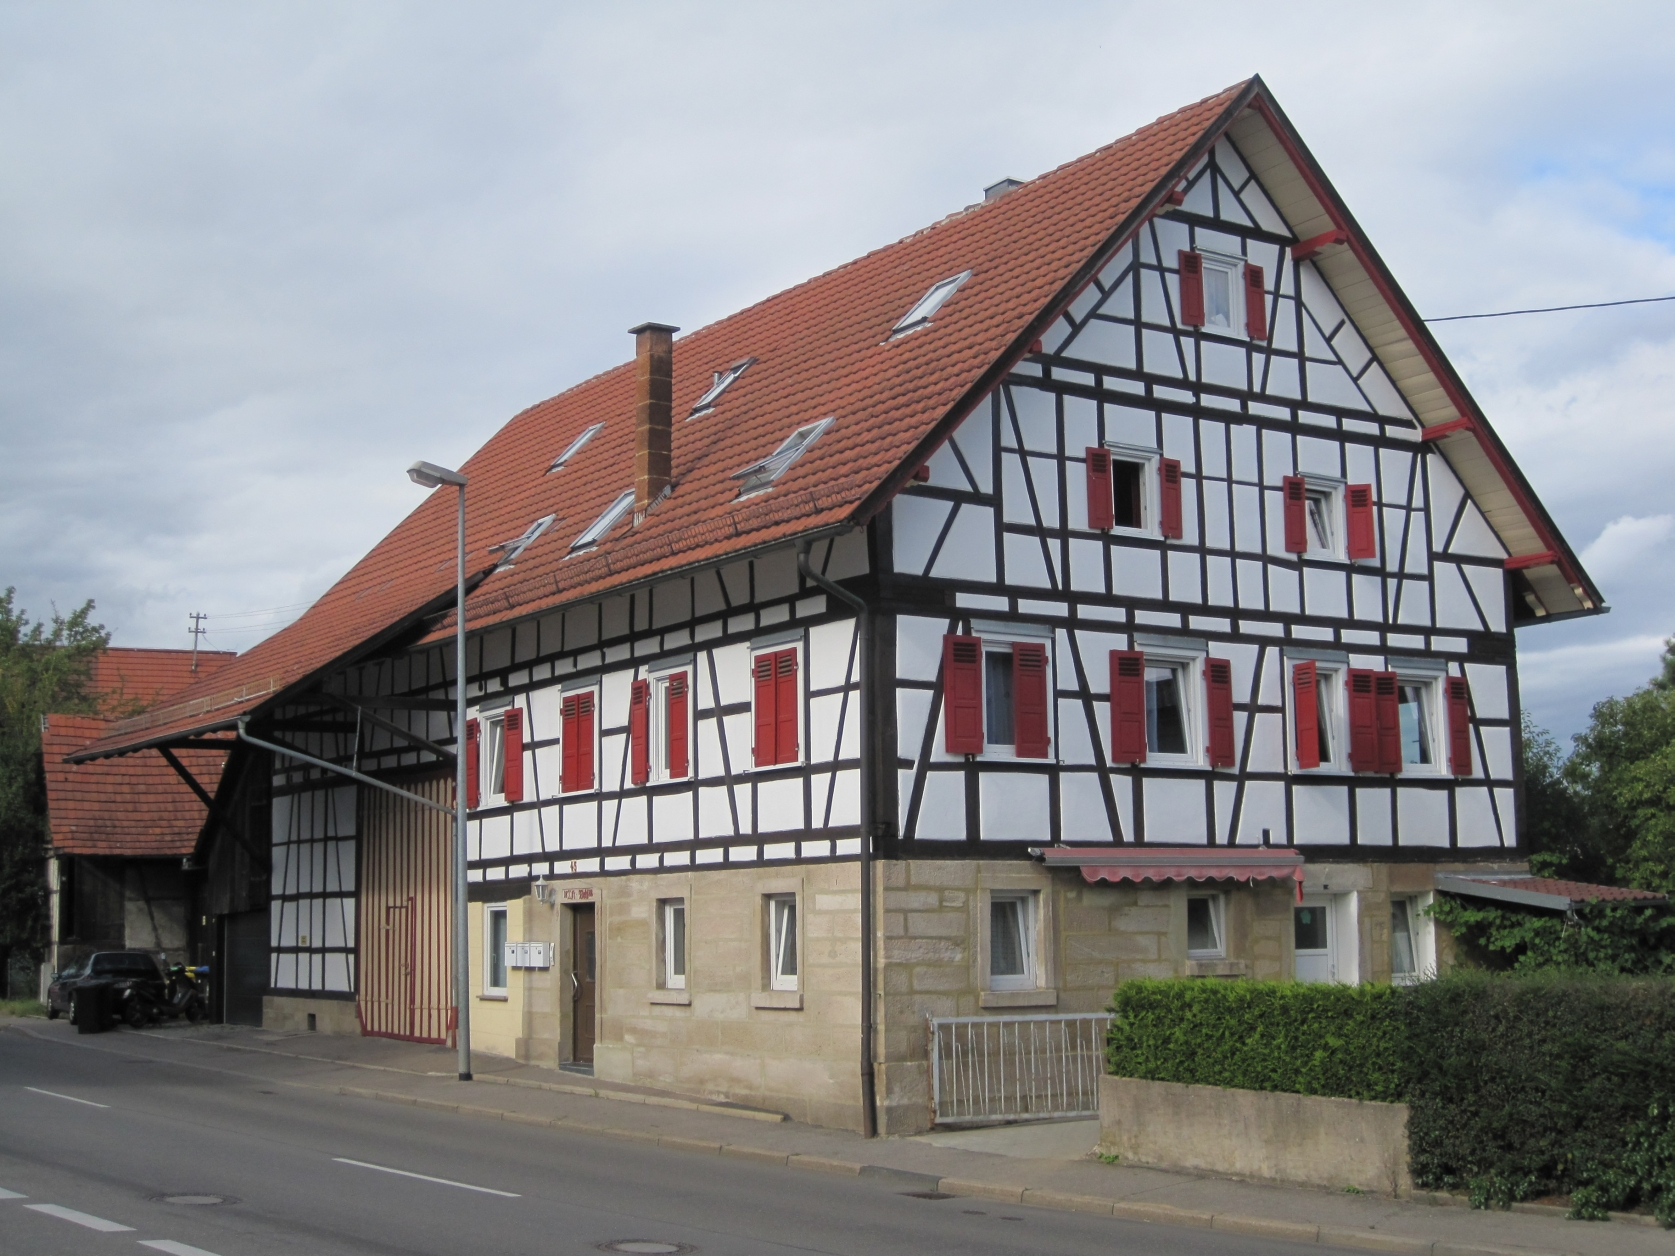 Leinfelden-Echterdingen Germany  City new picture : Beschreibung Leinfelden Echterdingen OT Stetten Bauernhaus 01